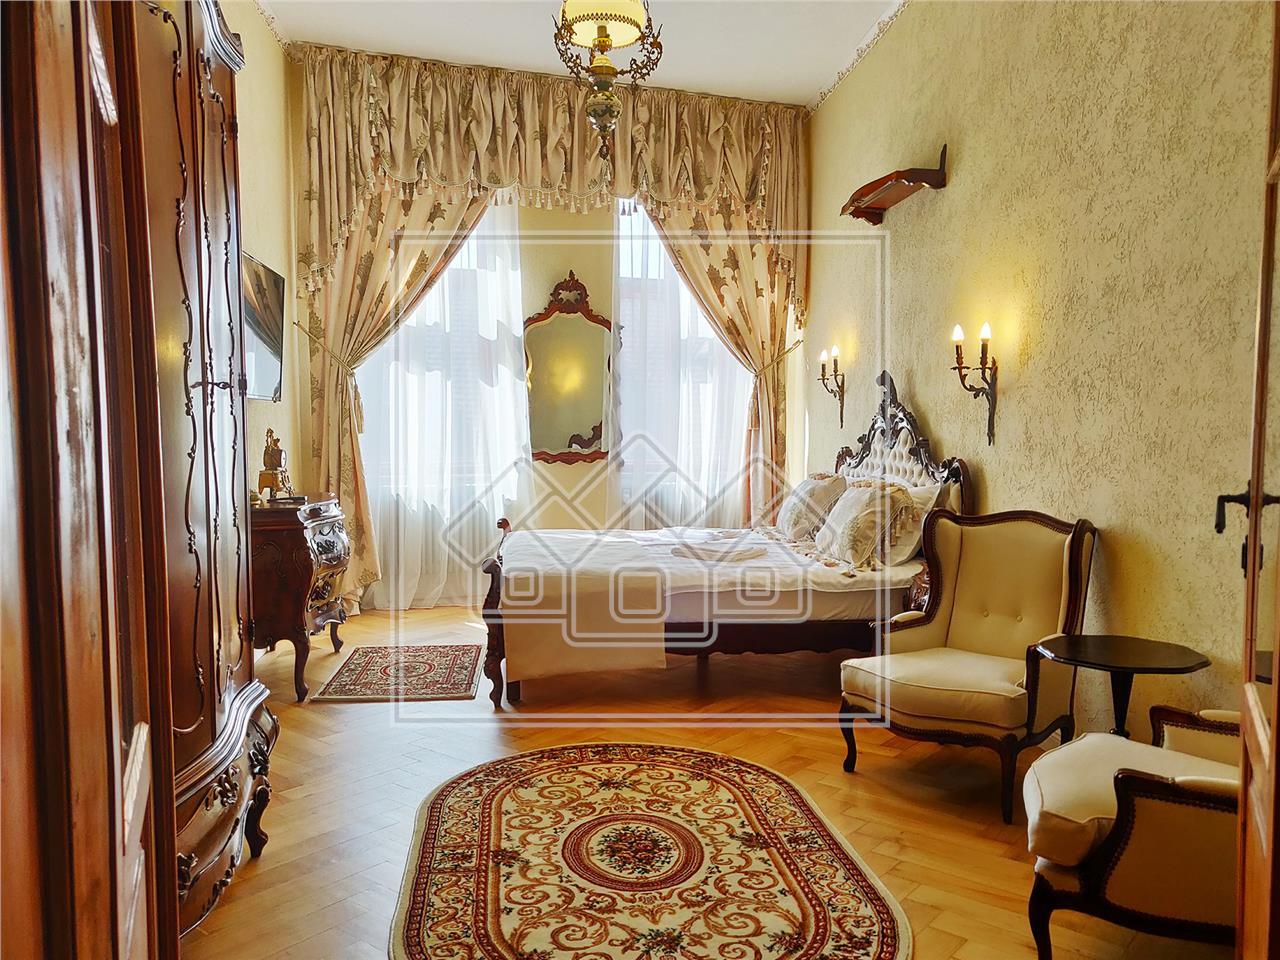 Apartament de inchiriat in Sibiu - 3 camere - Central